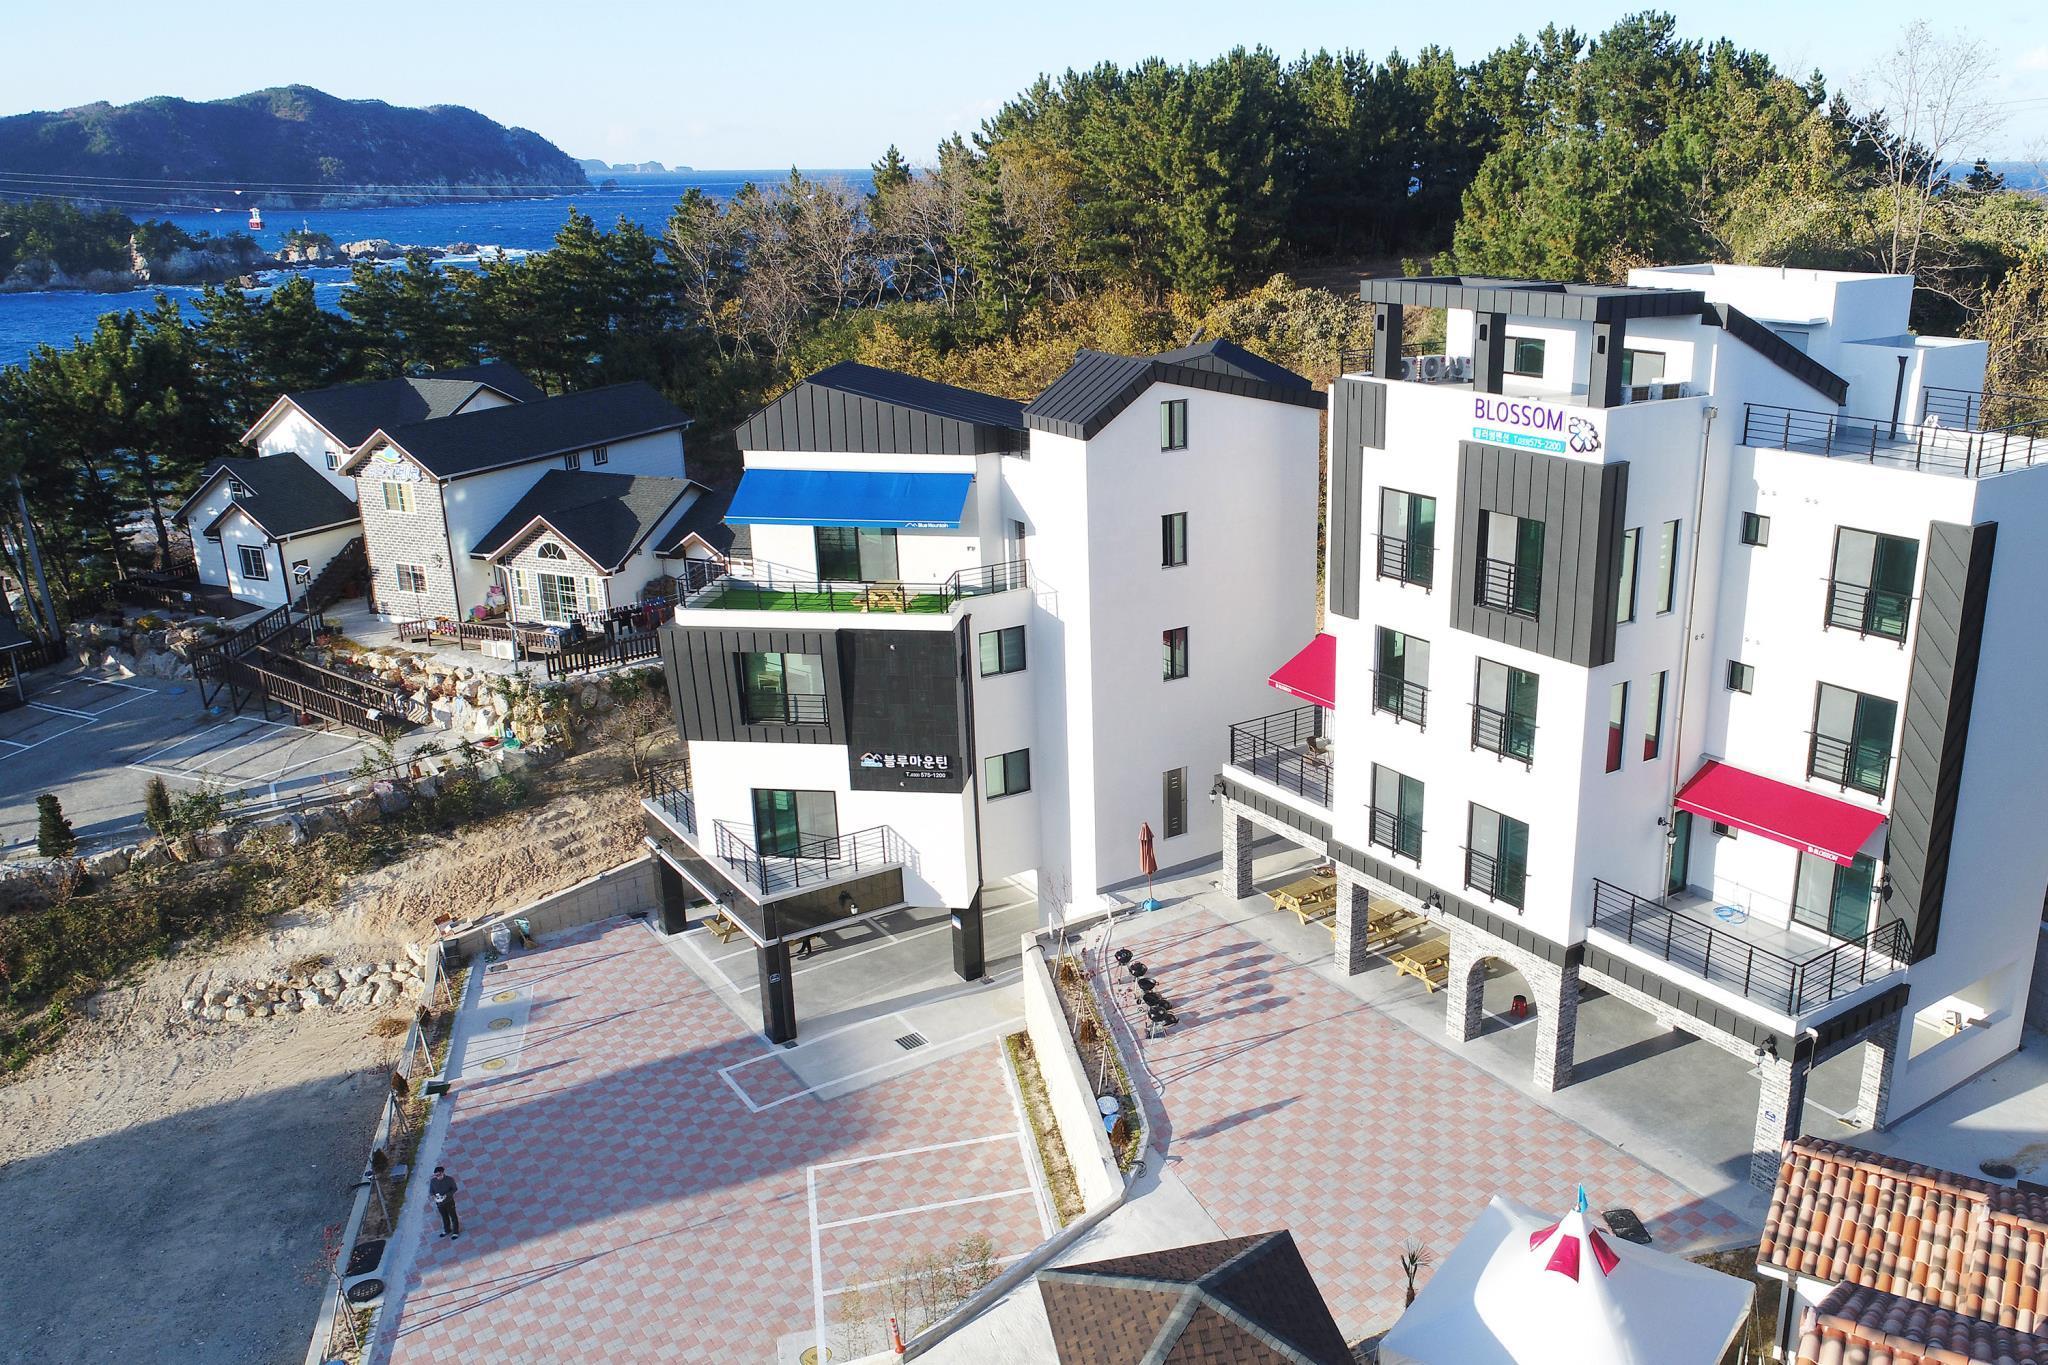 Samcheok Blue MountainsD401 Reviews